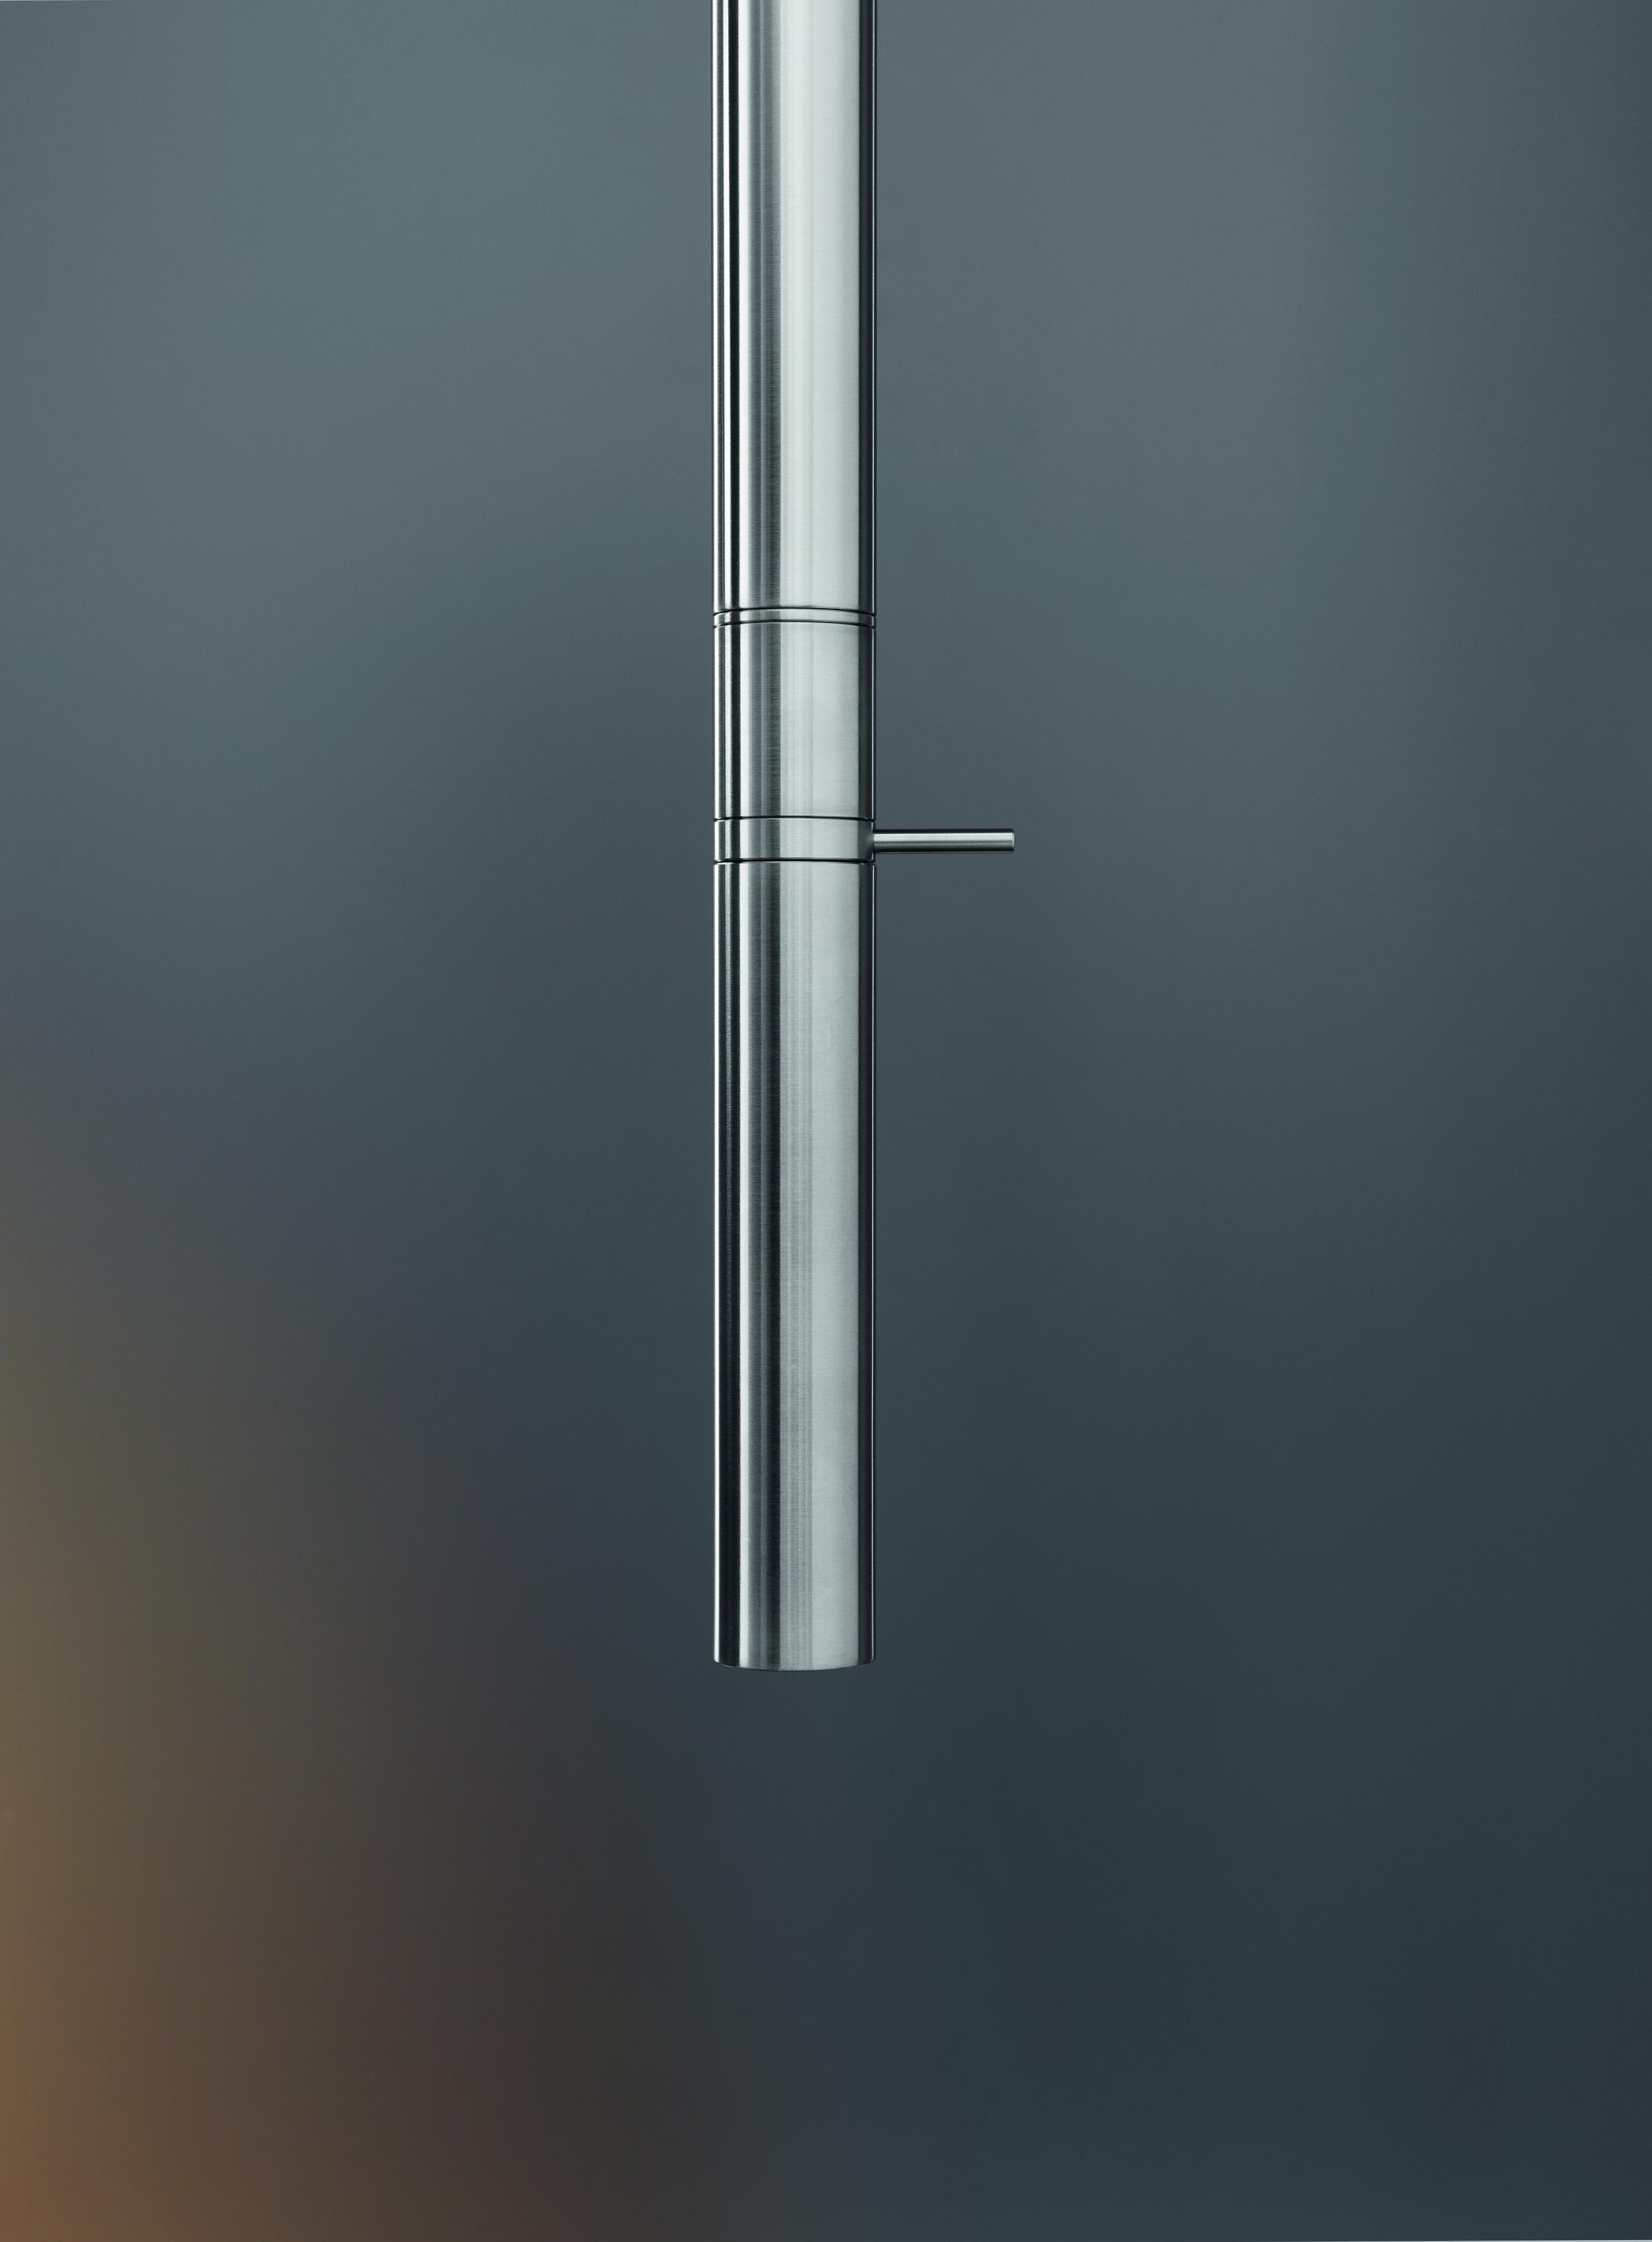 Modern Gradi Ceiling Mount Faucet